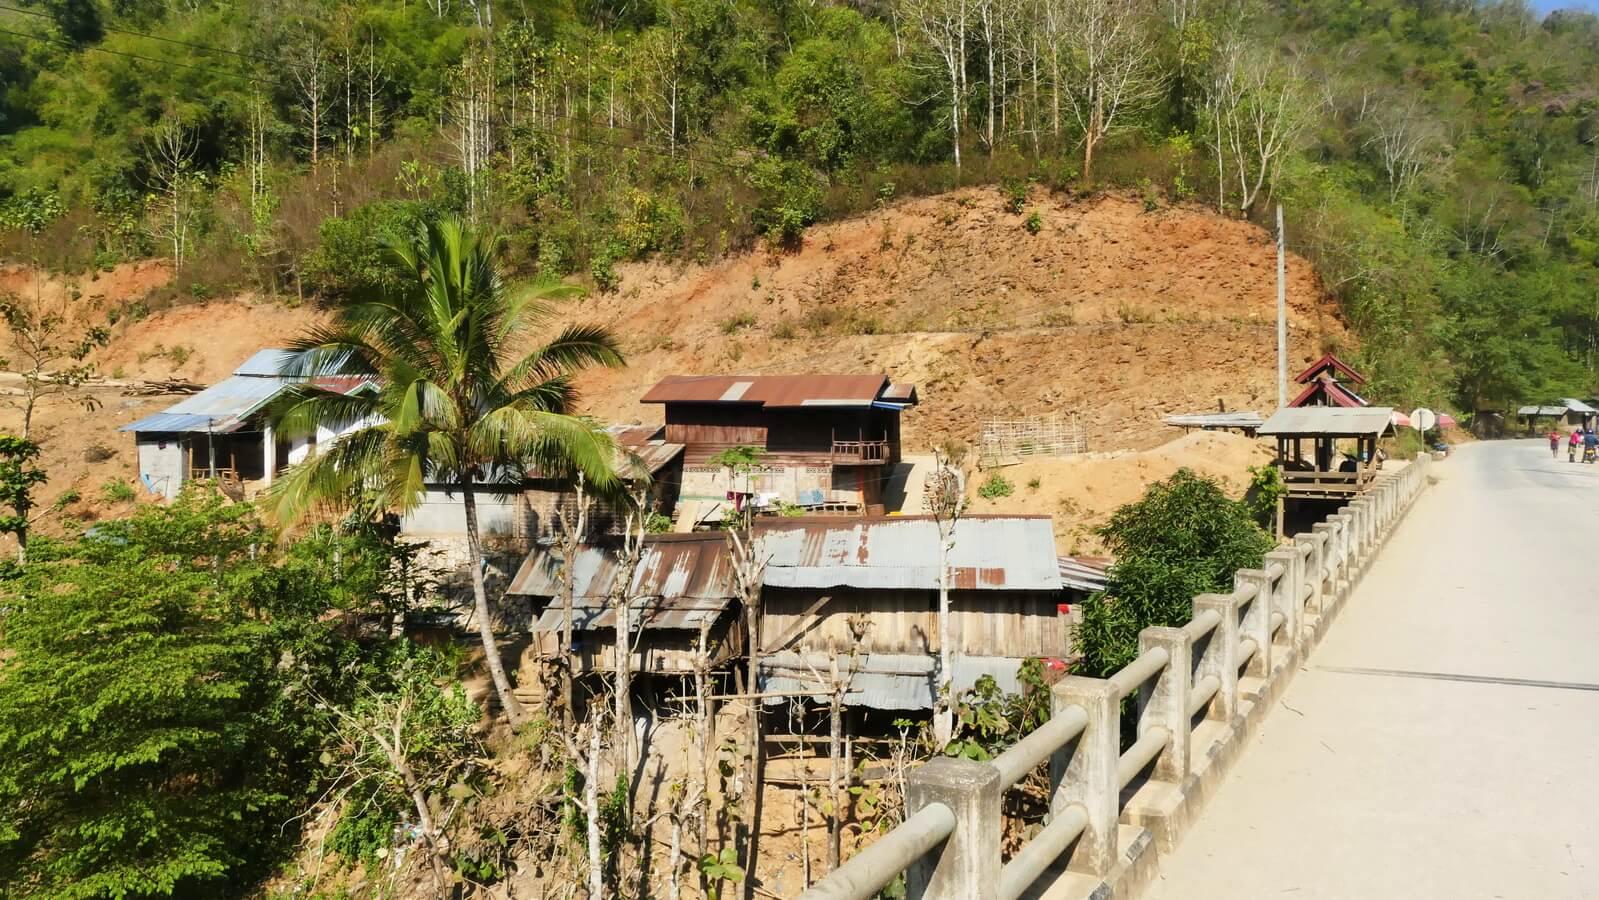 Siedlung-Laos